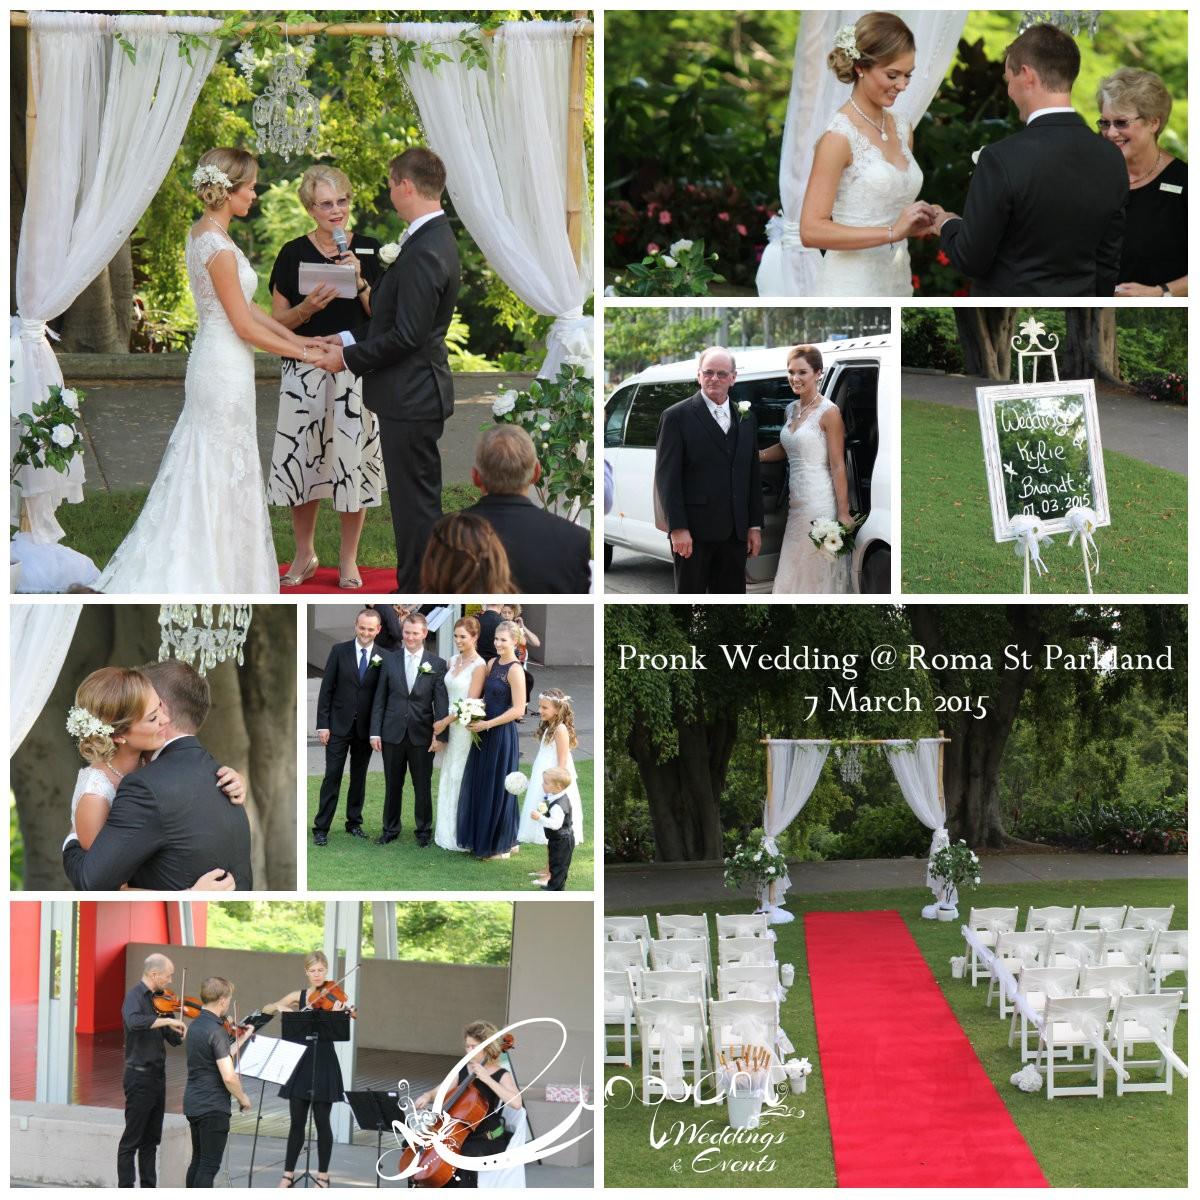 Studi romani wedding